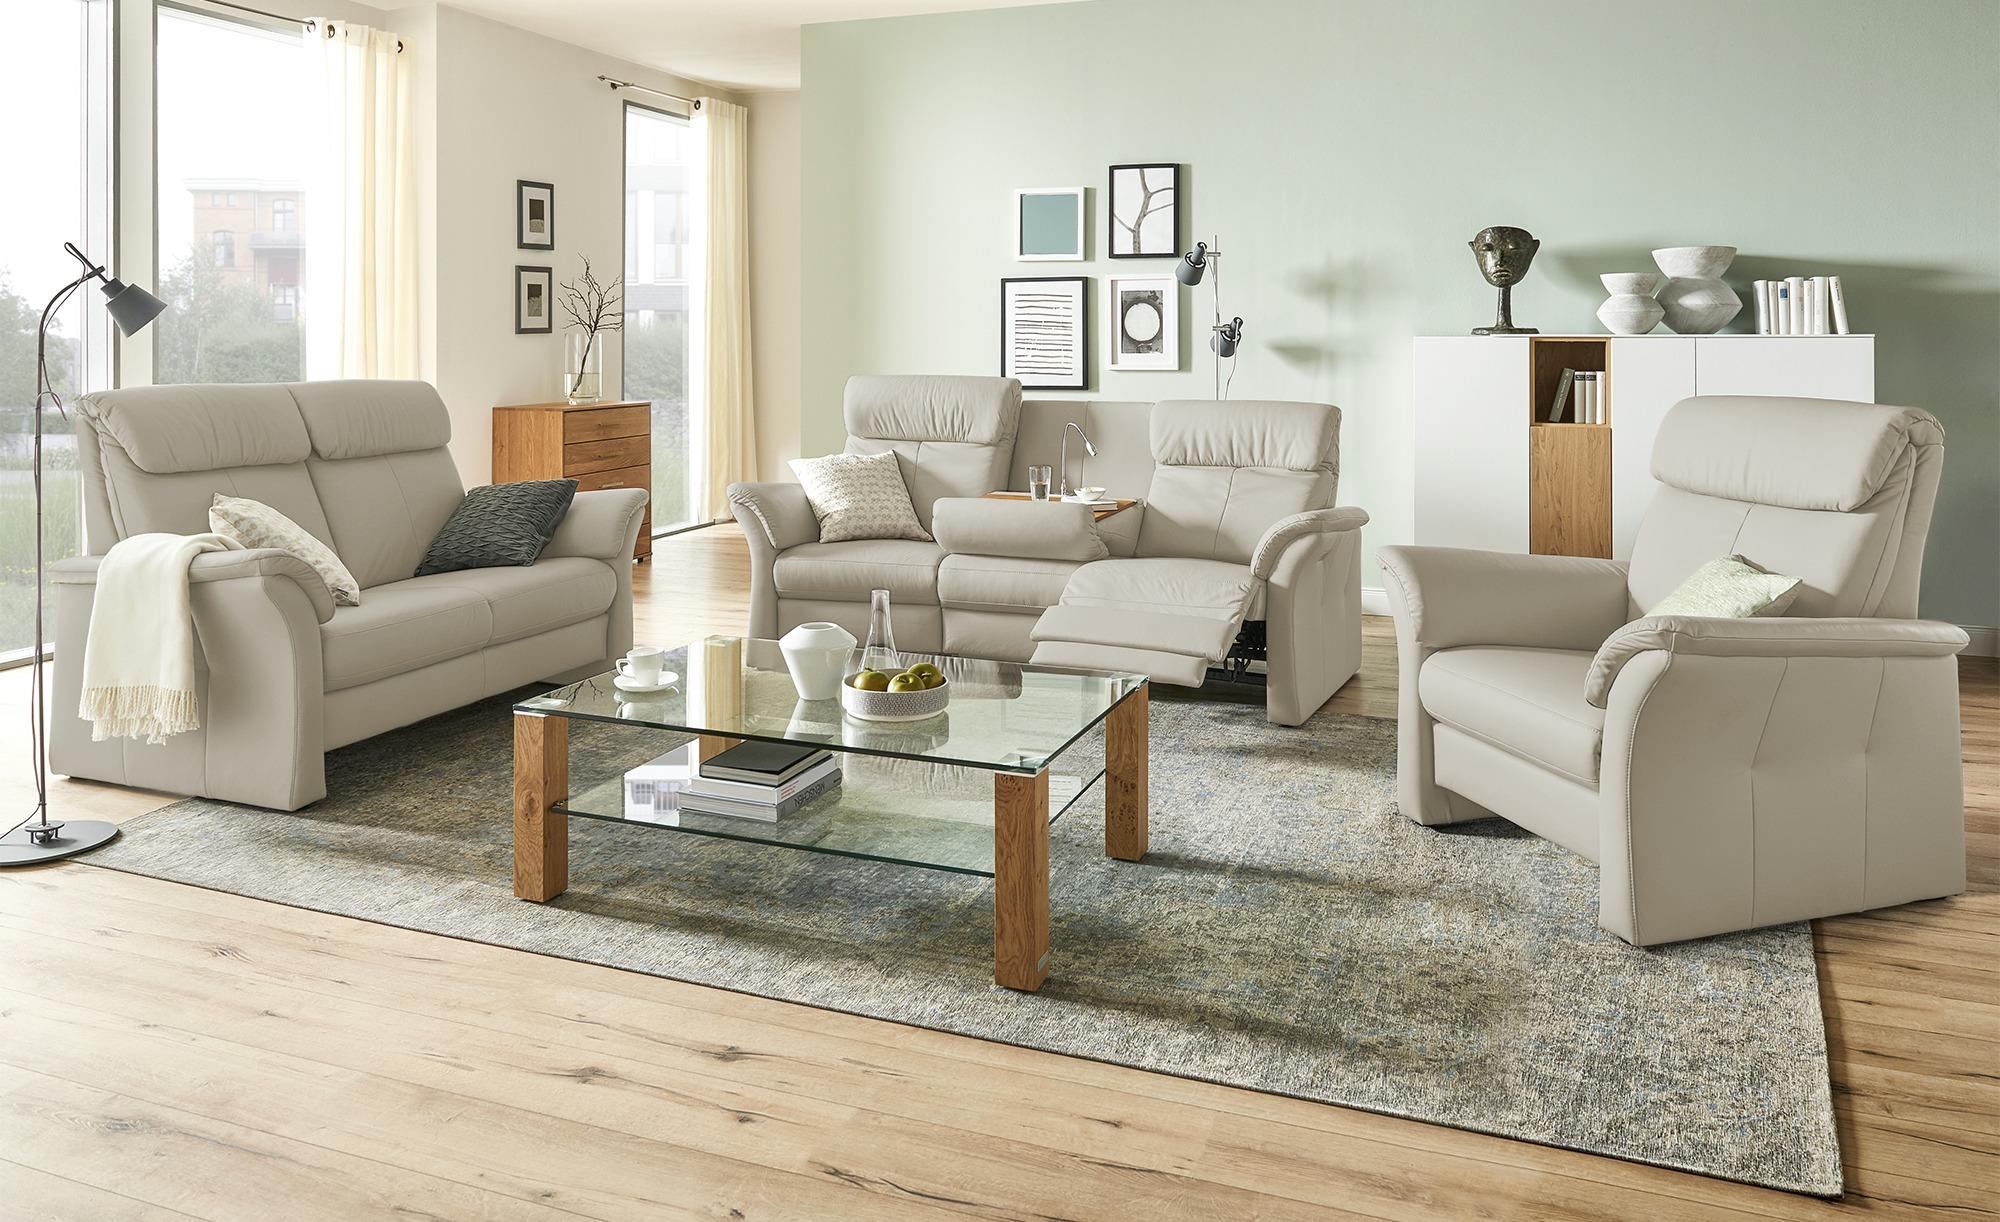 Wohnwert Sofa 2 Sitzer Hellgrau